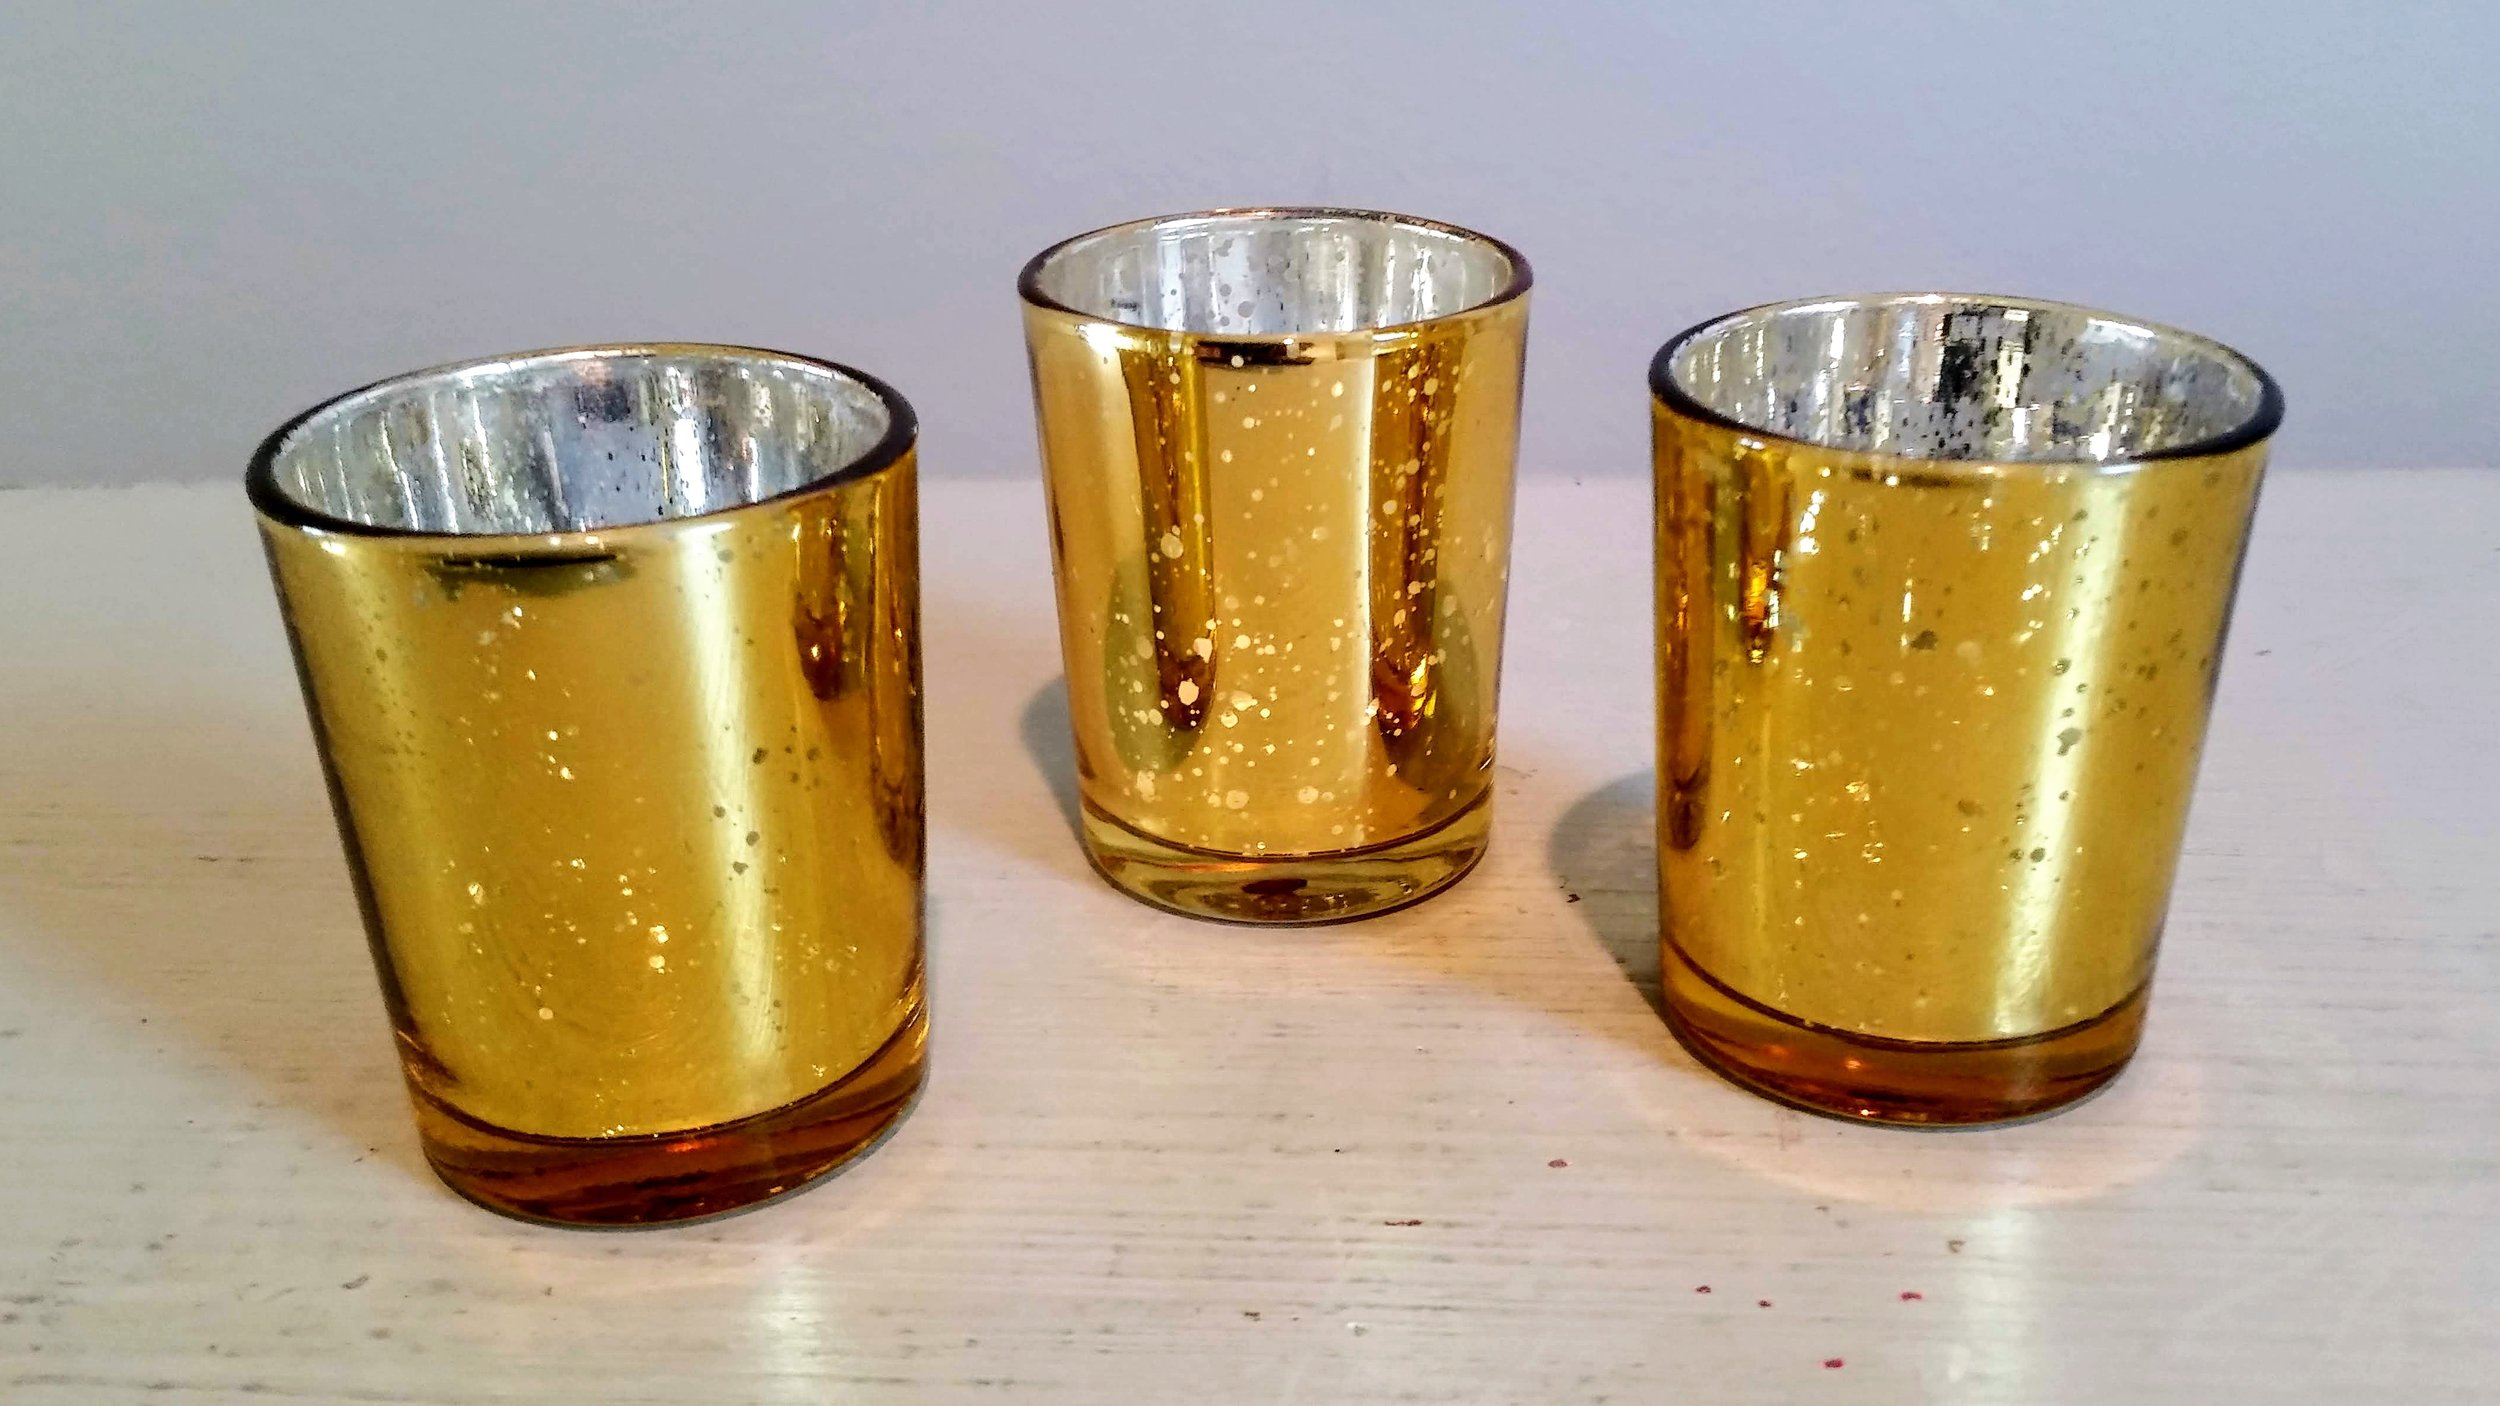 Gold Mercury Votives - Description ~ gold mercury glass holders for votive candles or tealightsQuantity ~ 144Price ~ .50 each